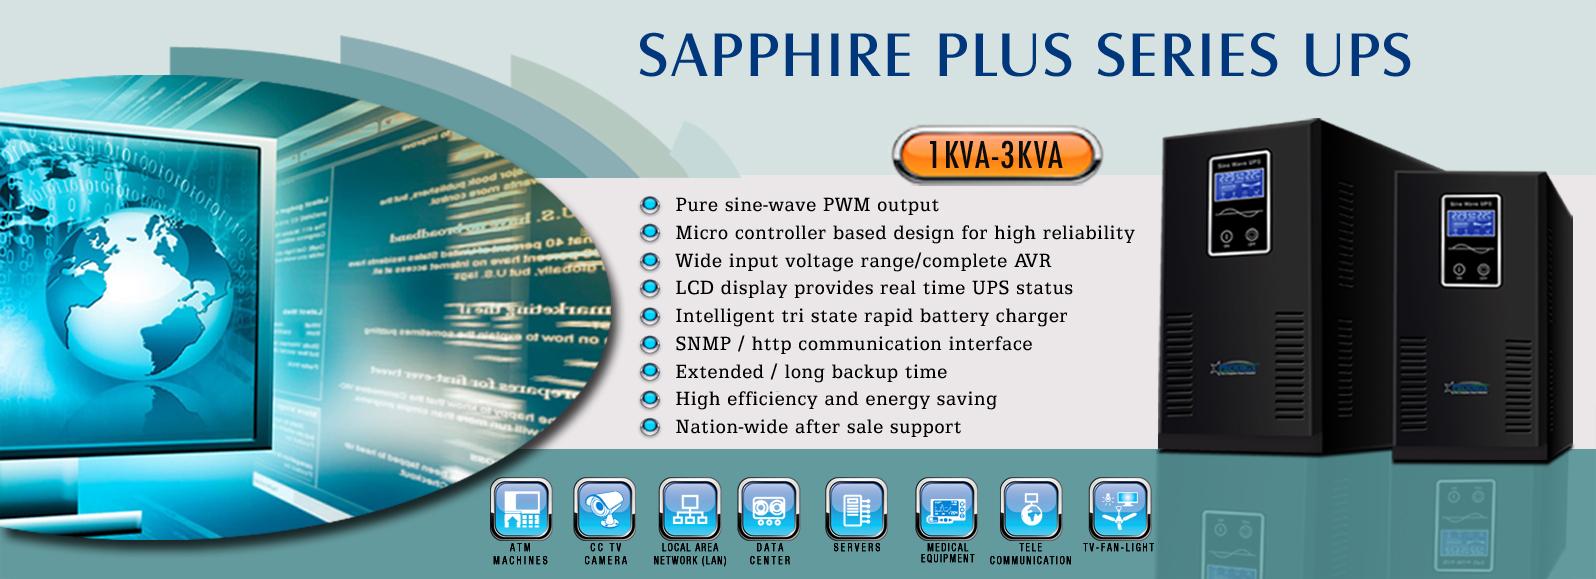 Sapphire Plus Series UPS